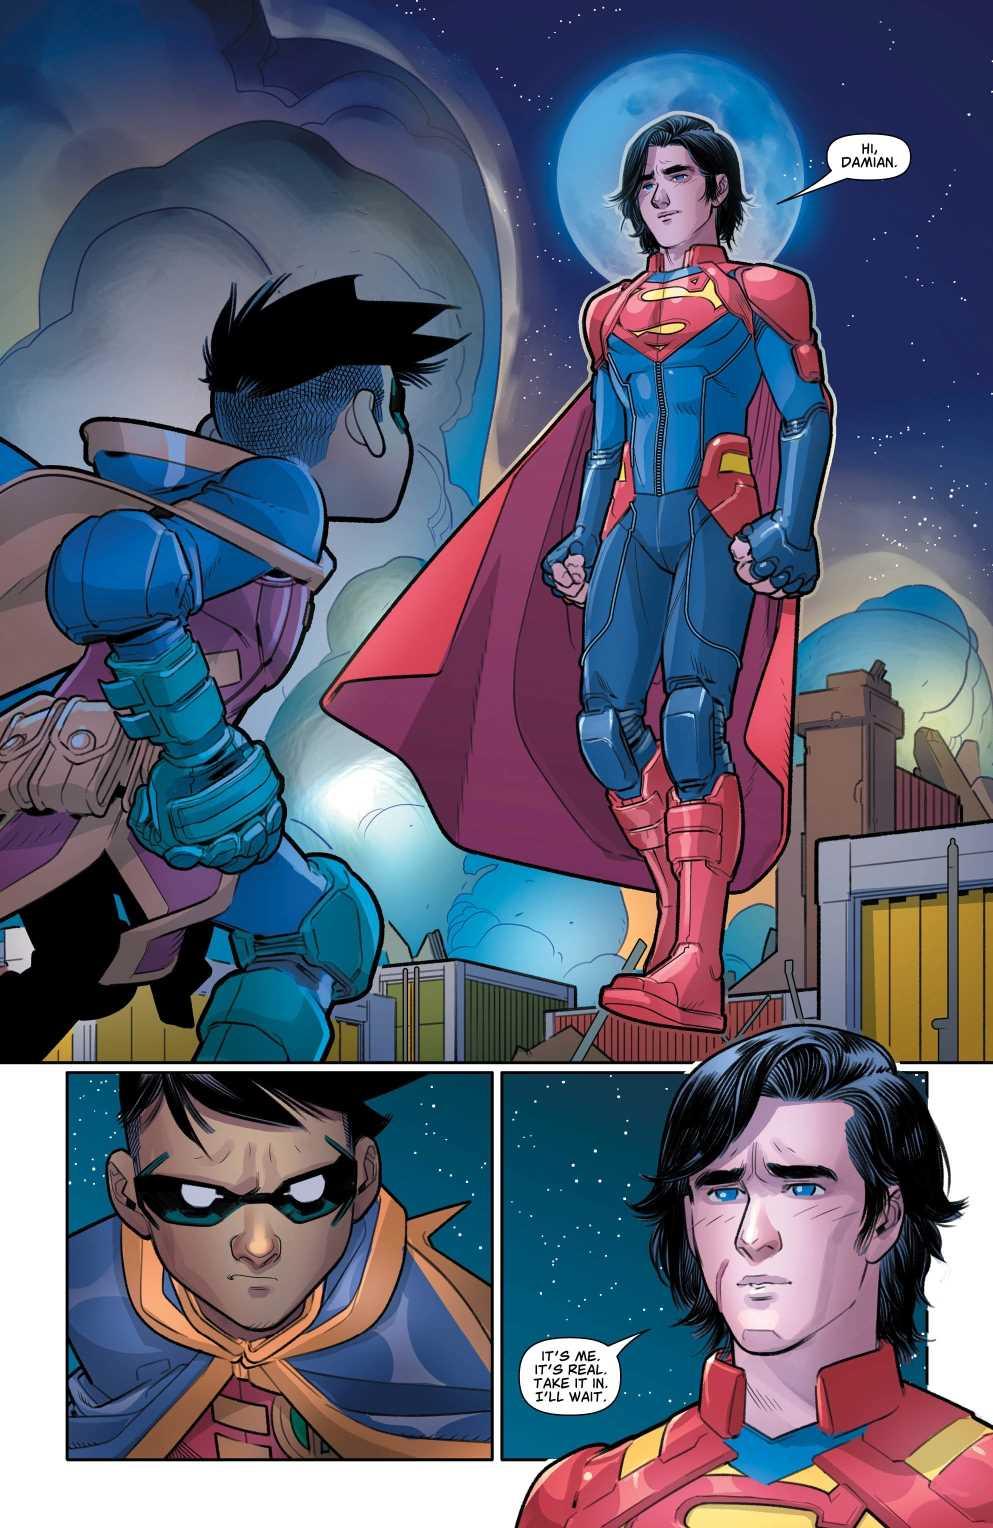 Reencuentro de Damian con Jon Kent, Superboy